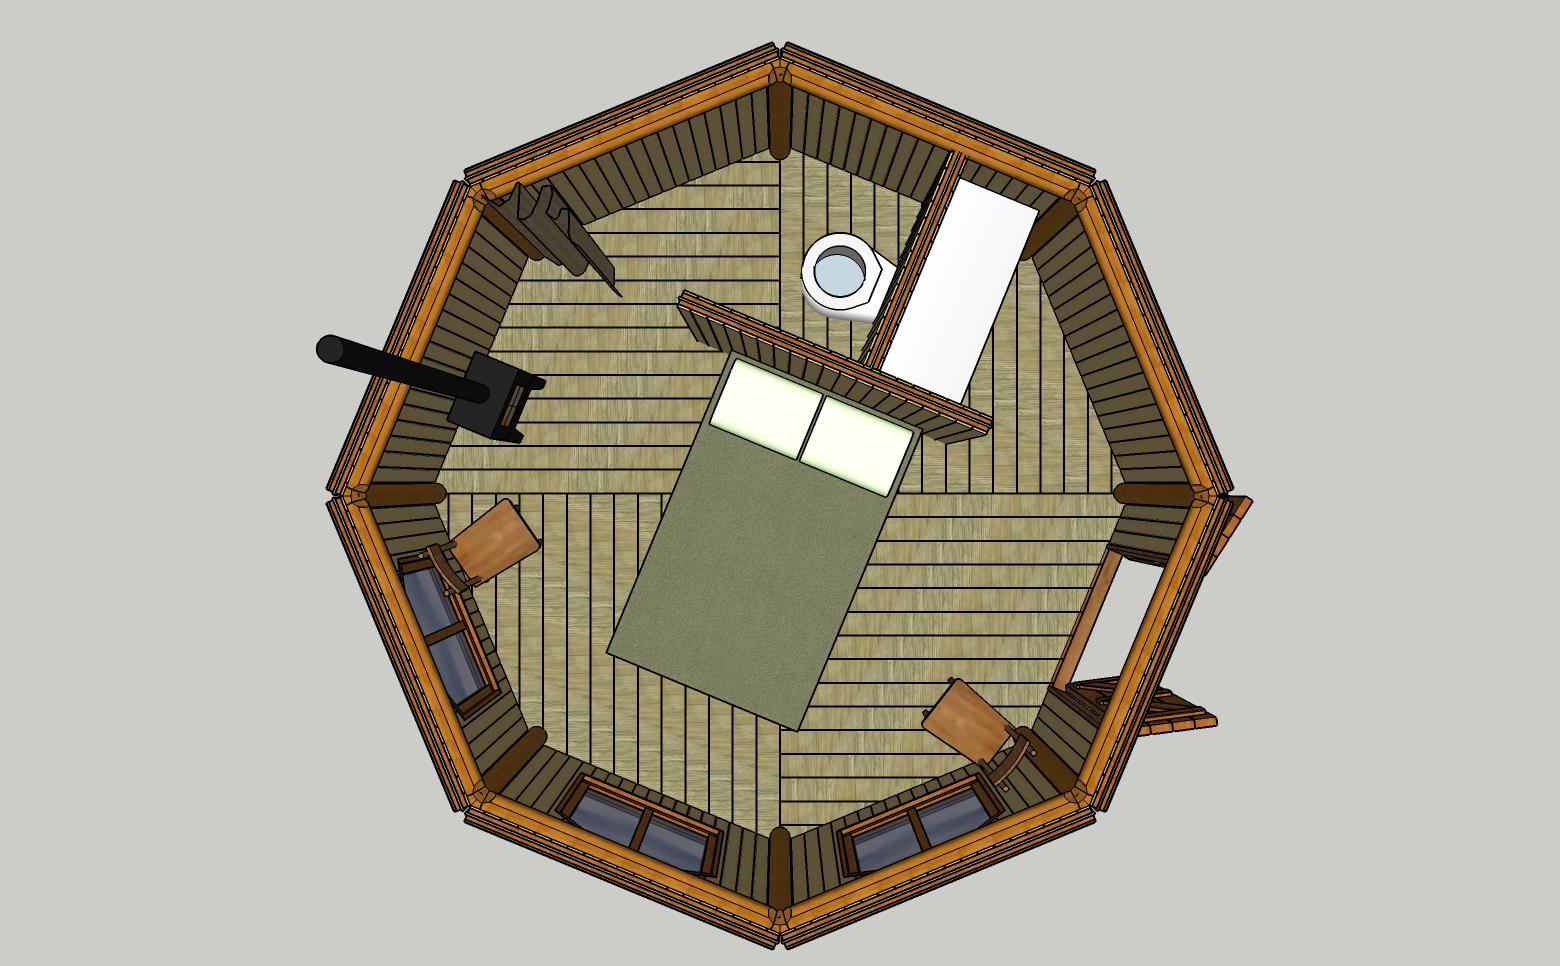 Octo-Pod plan